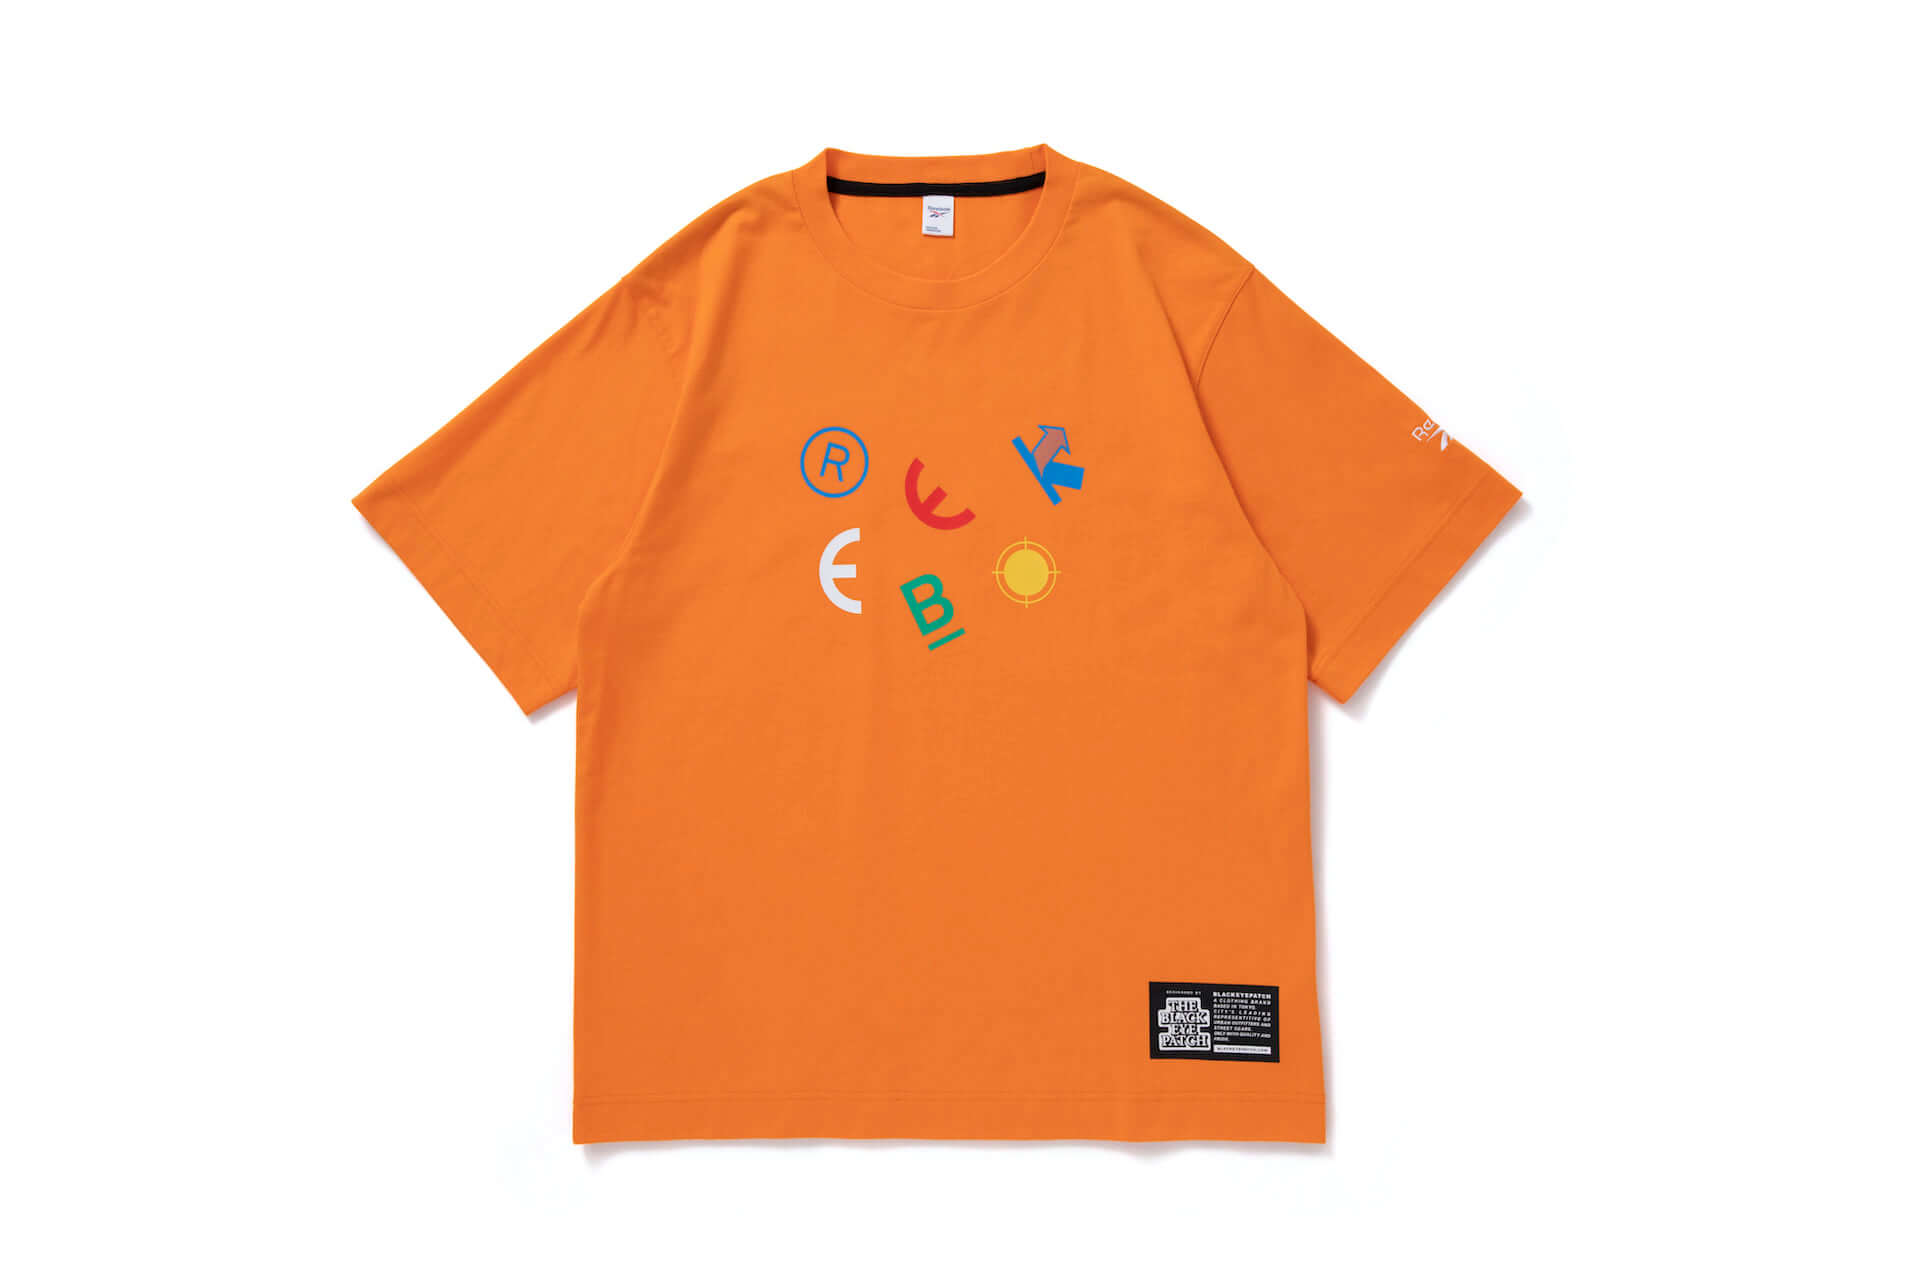 BlackEyePatchがReebokのデザインを再構築!「CLUB C BEP」やTシャツ含むフルコレクションが登場 lf200716_reebok_8-1920x1280